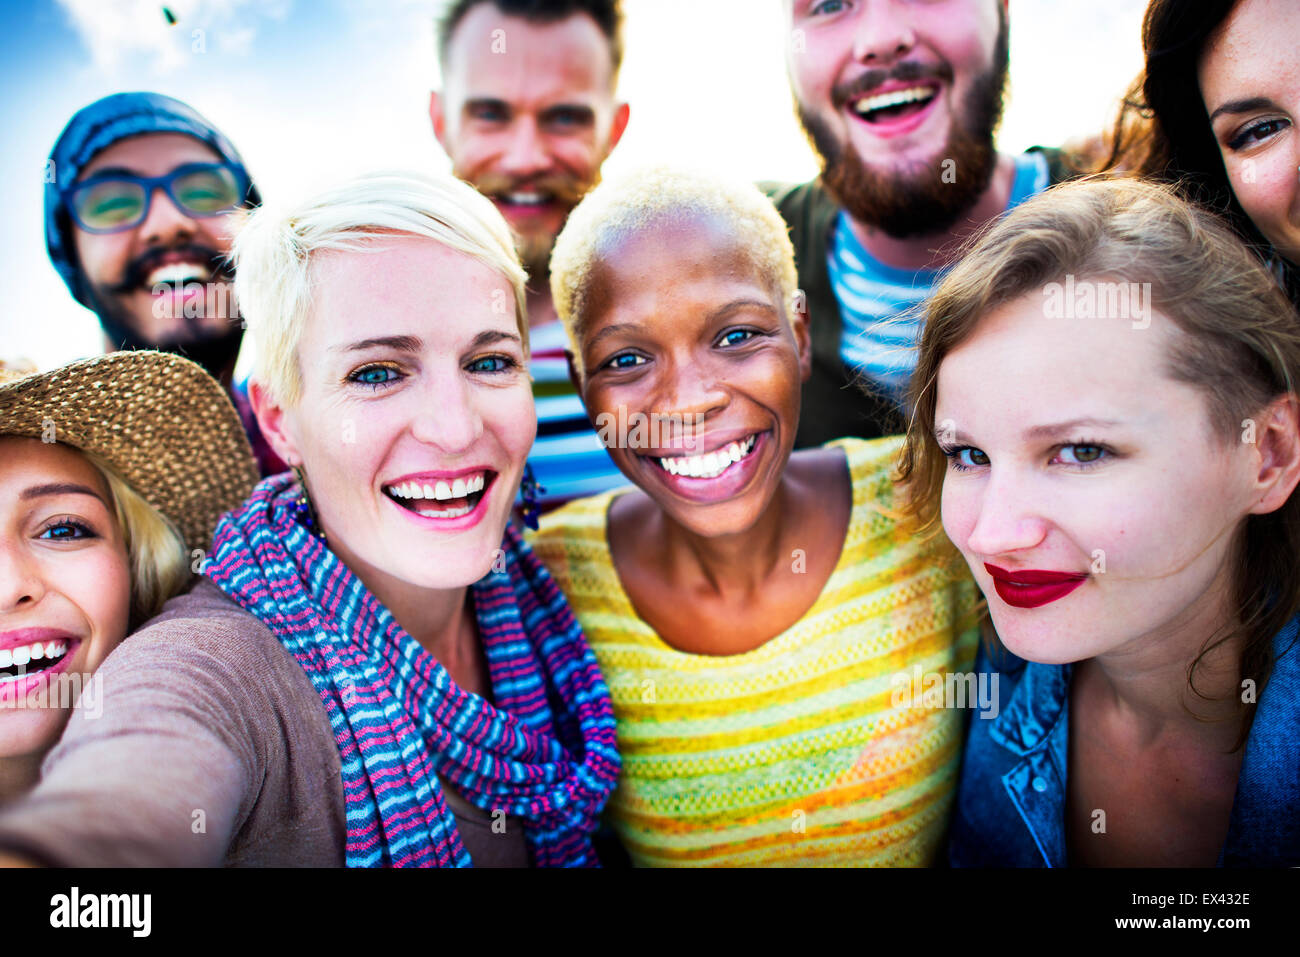 Freundschaft Selfie Glück Strand Sommer Konzept Stockfoto